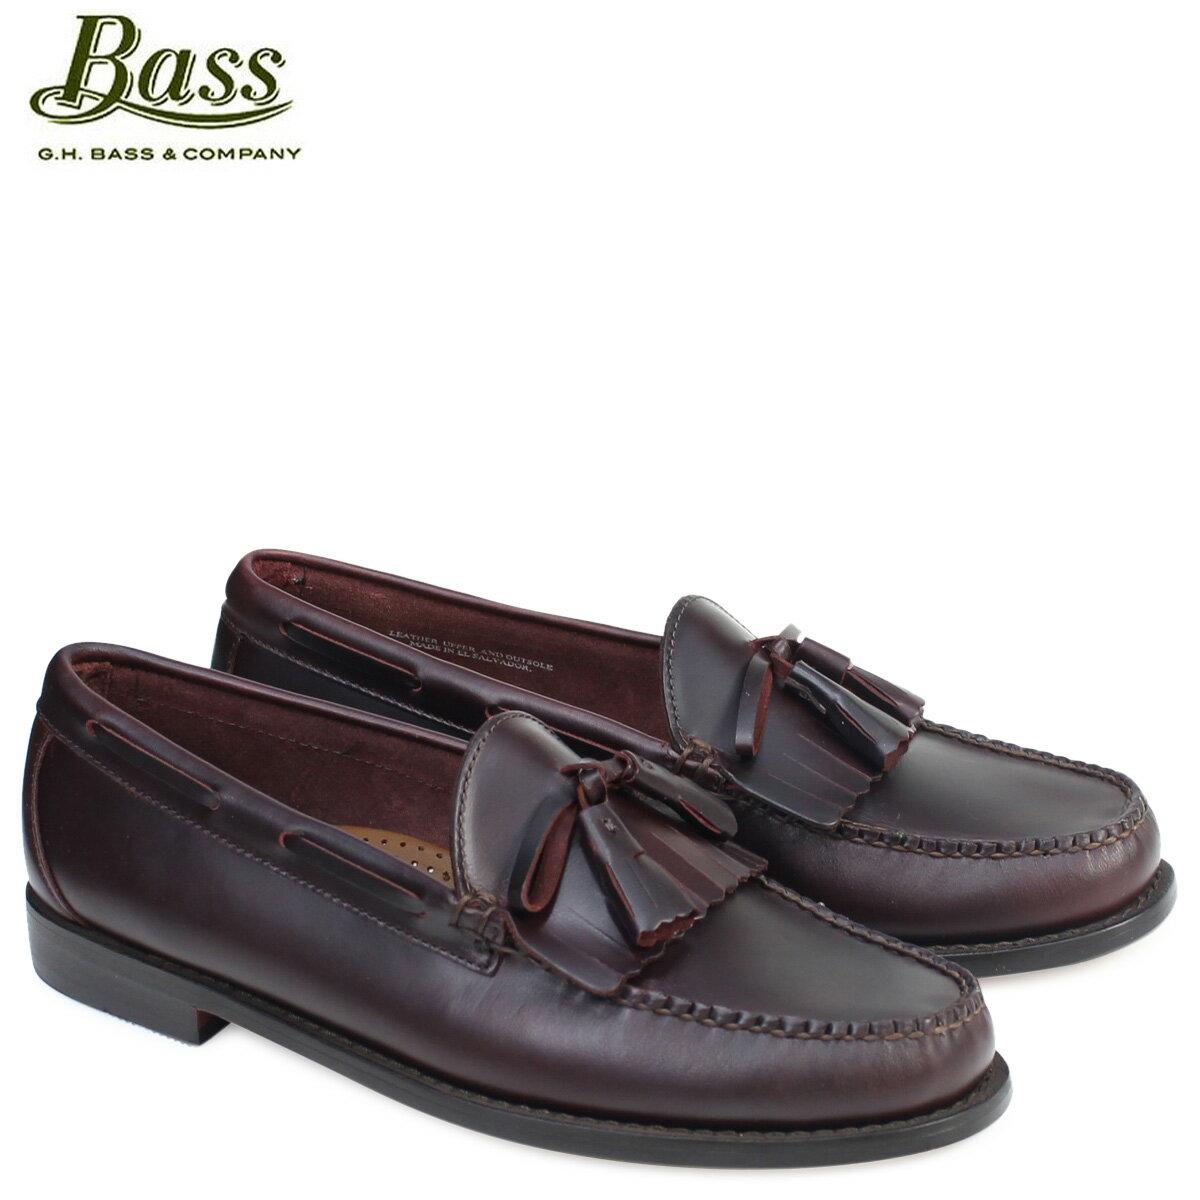 G.H. BASS ローファー ジーエイチバス メンズ タッセル LAWRENCE KILTIE WEEJUNS 70-80918 靴 バーガンディ [2/1 追加入荷]